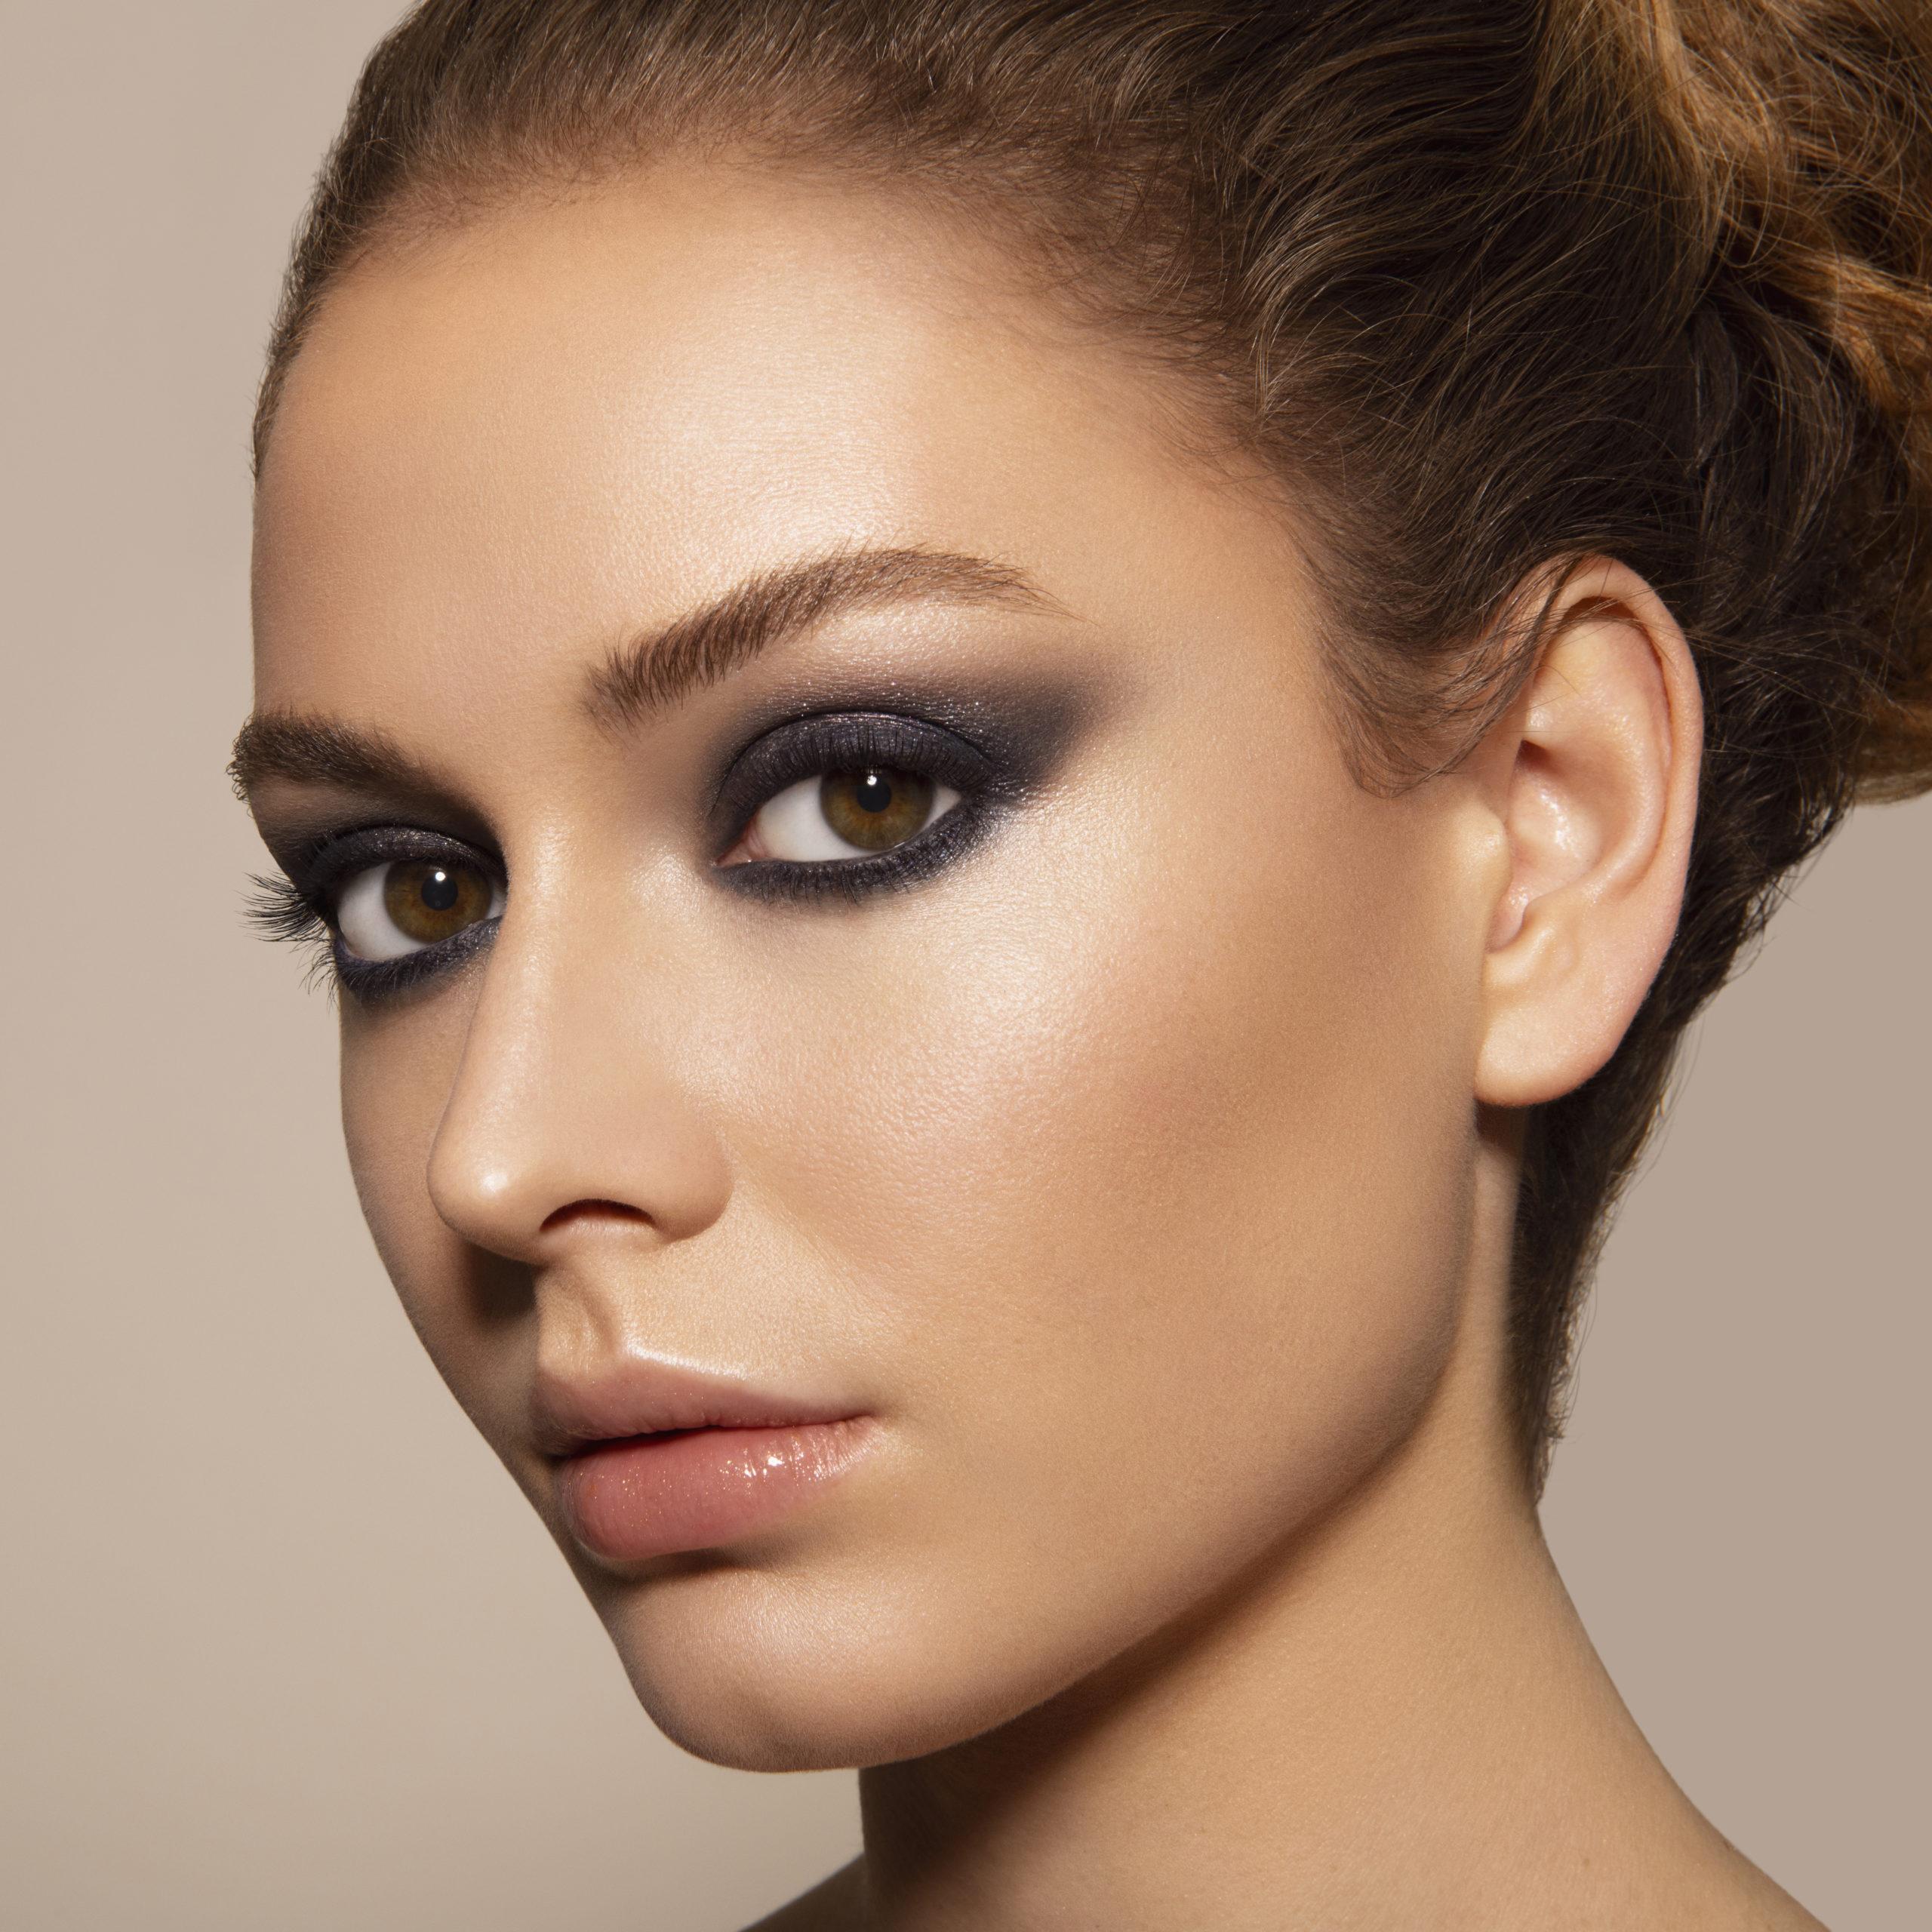 Model wearing classic blue smokey eye look